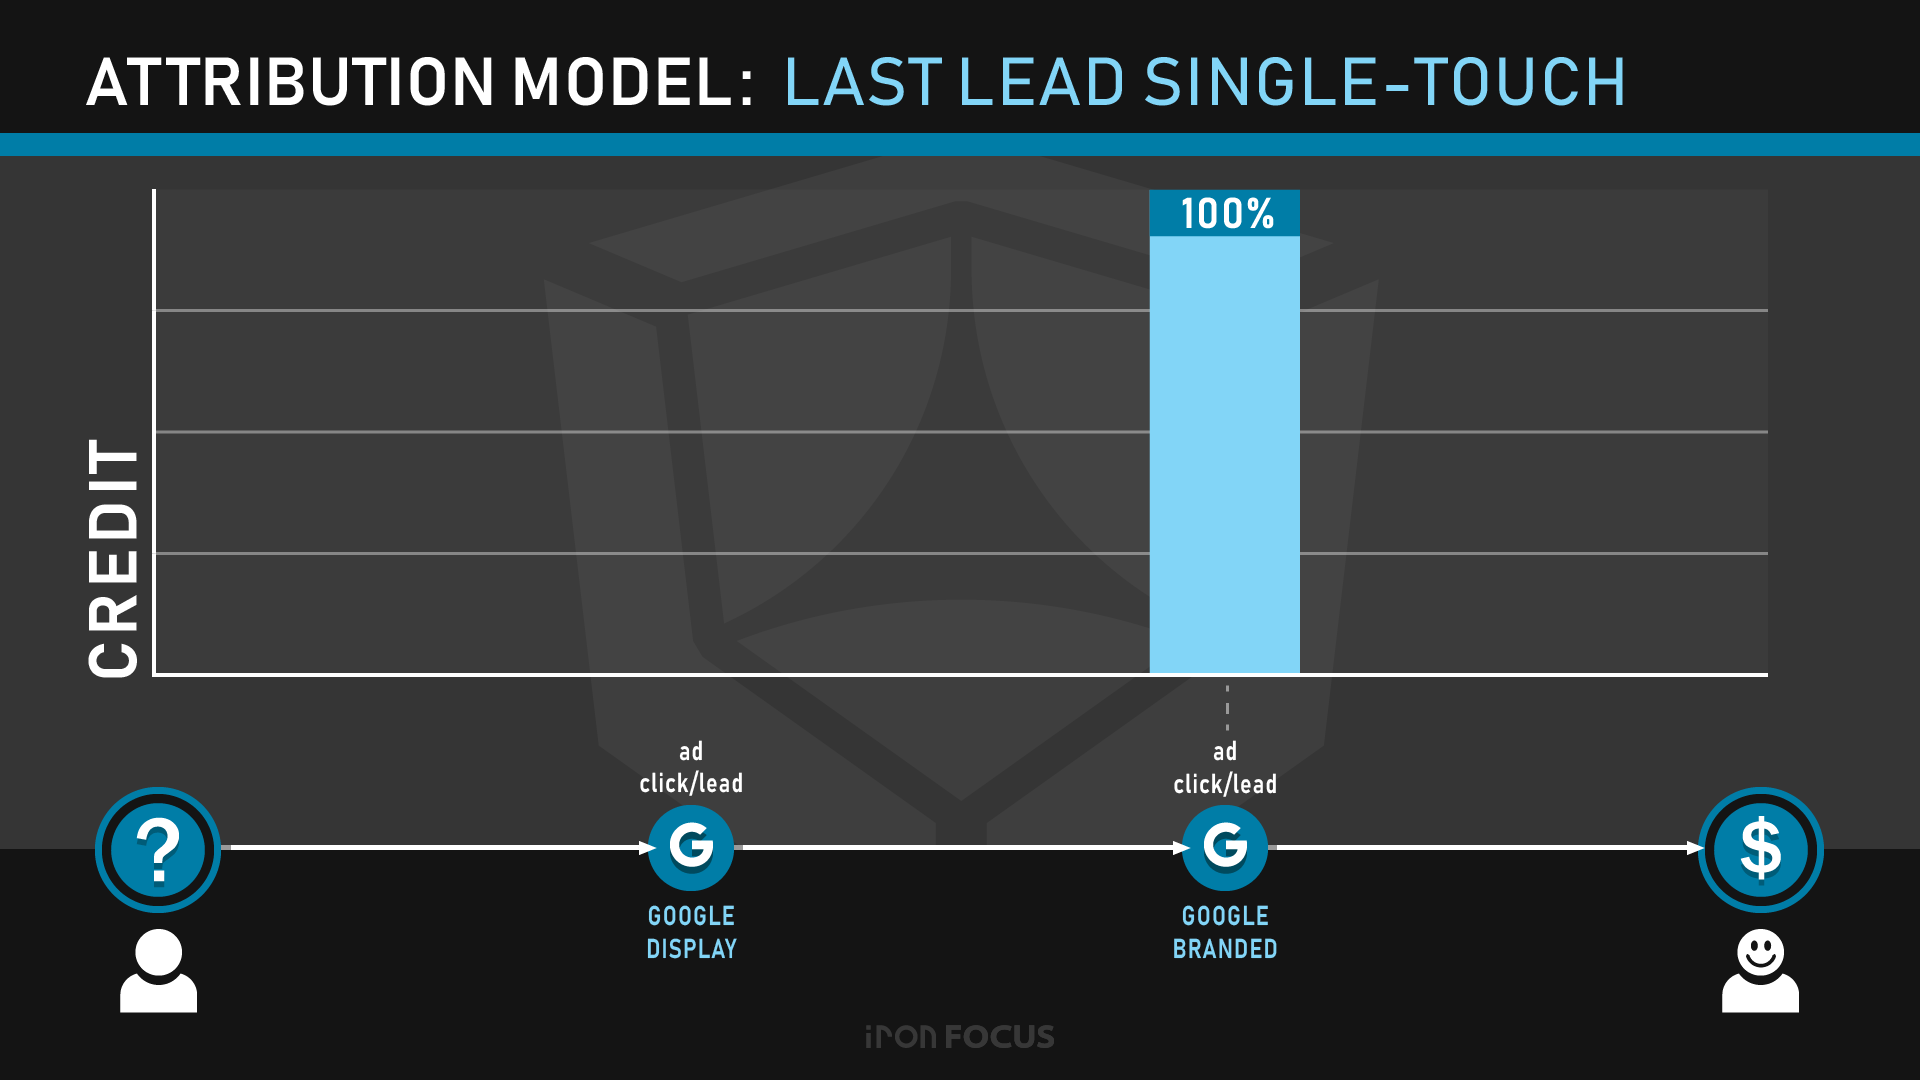 Attribution Model: Last Lead Single-Touch